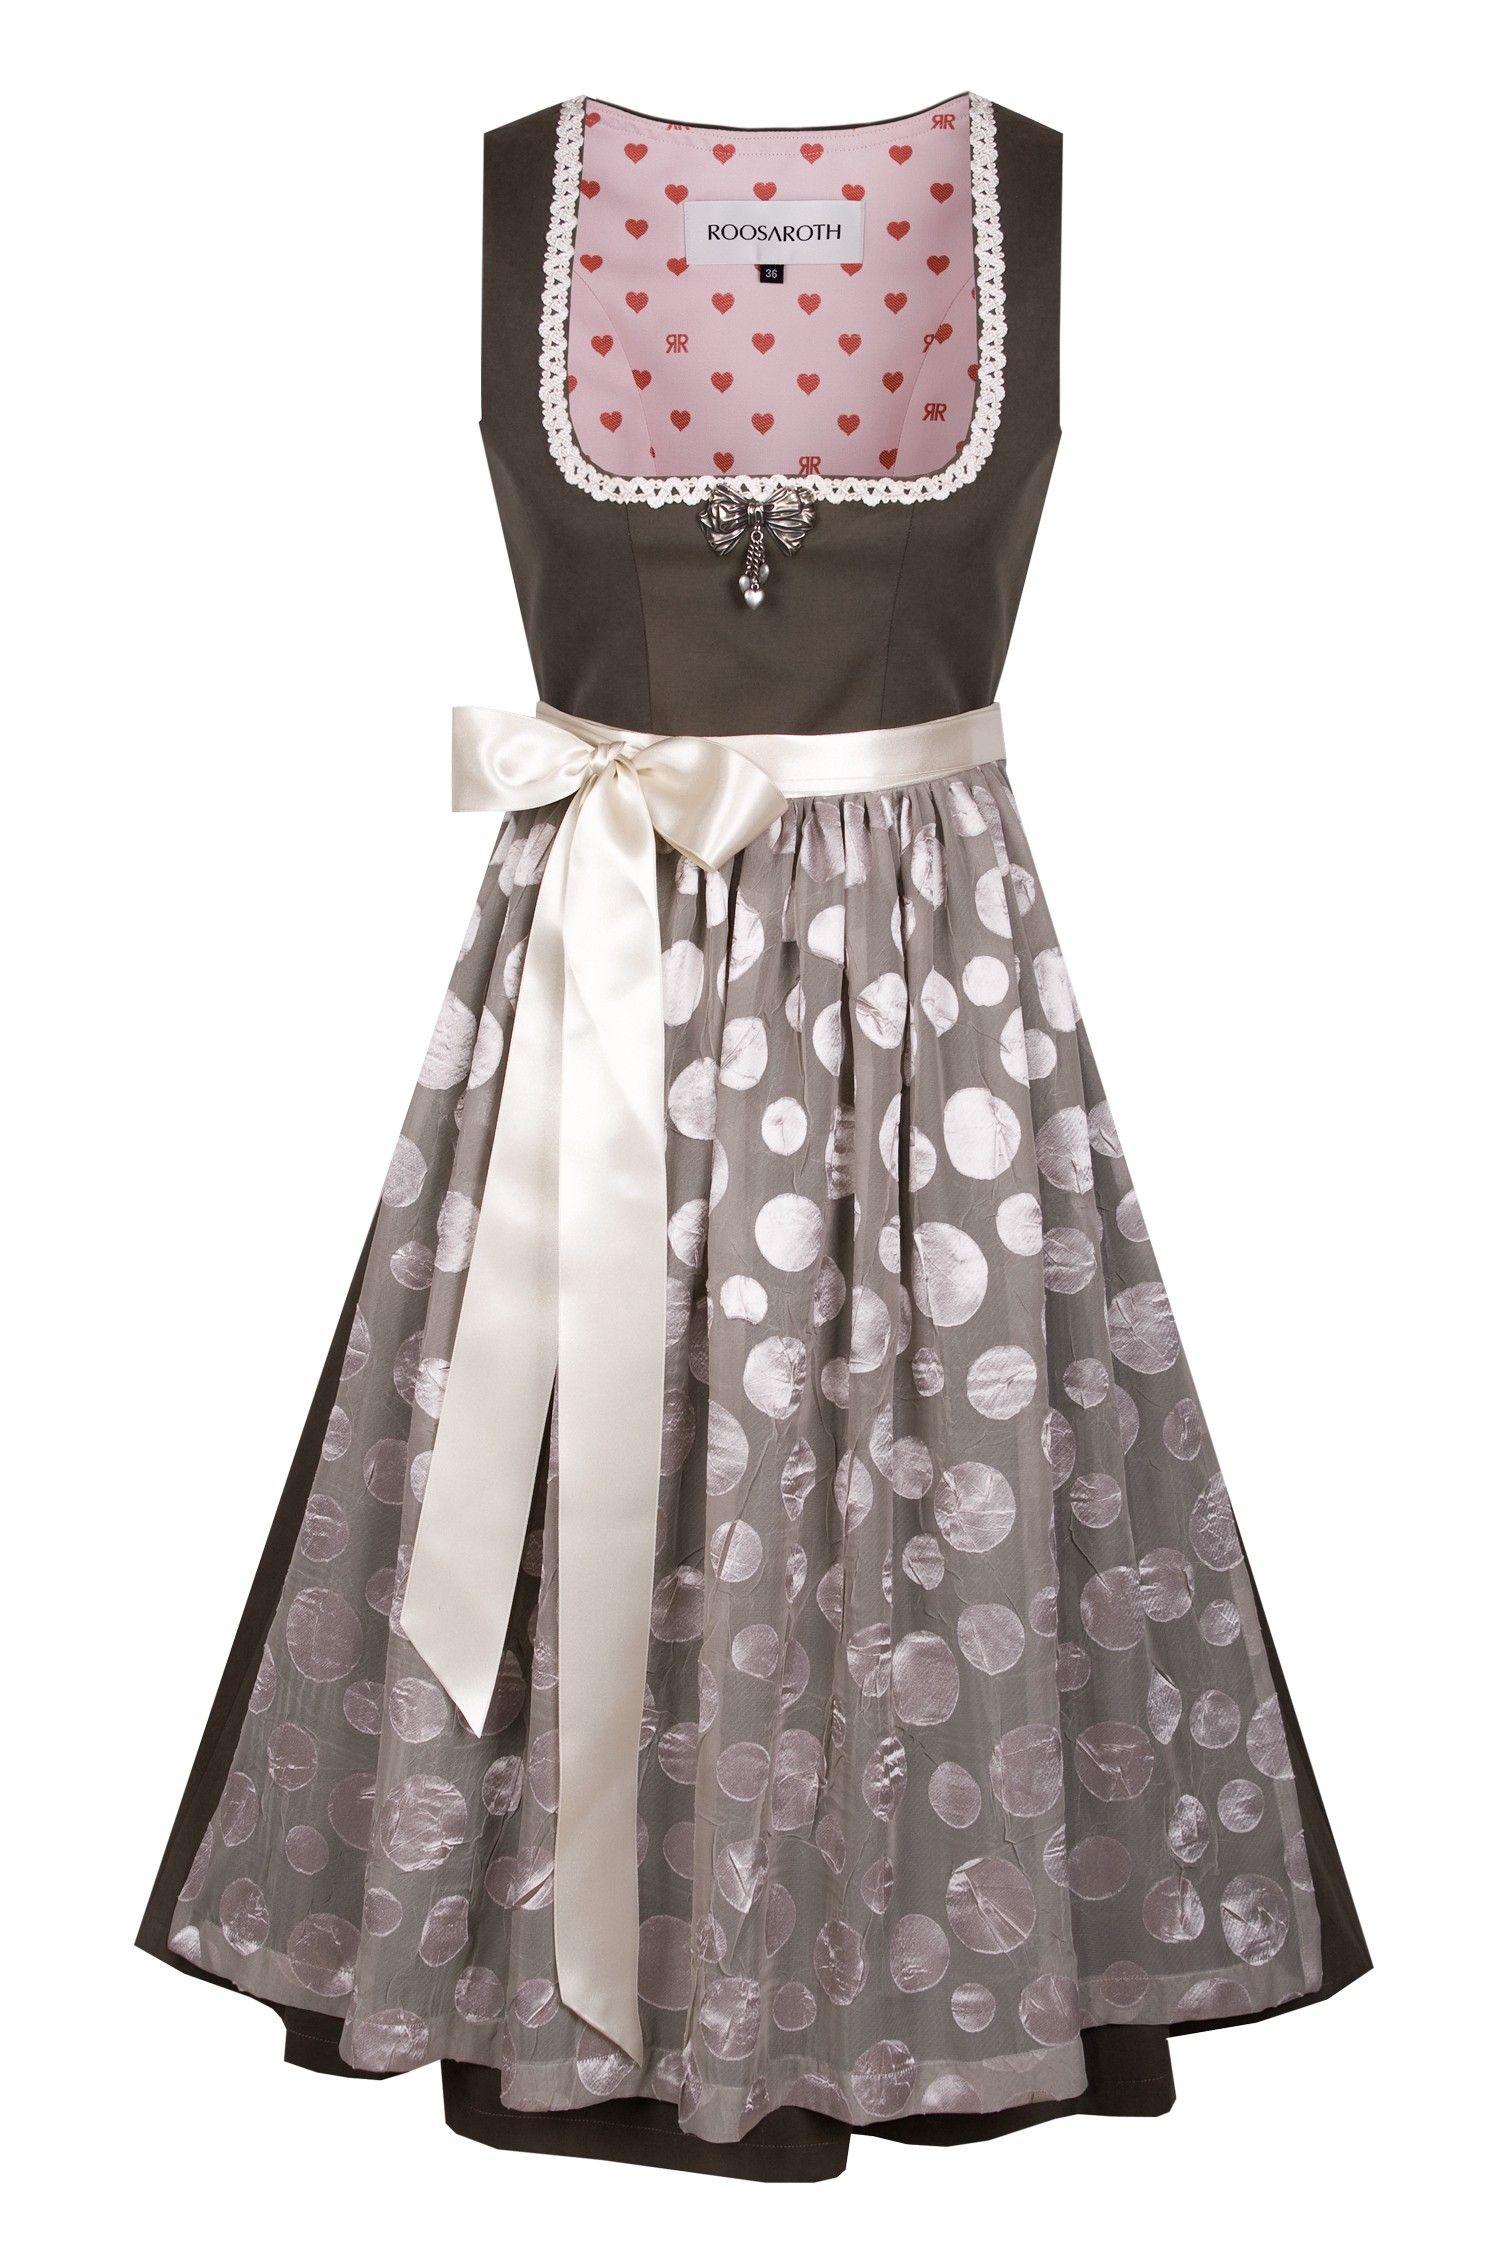 Dirndl HEIMATLIEBE   ROOSAROTH - Dirndl Couture   S❤ Oktoberfest Outfit,  Shop Sale, f979fe82ab